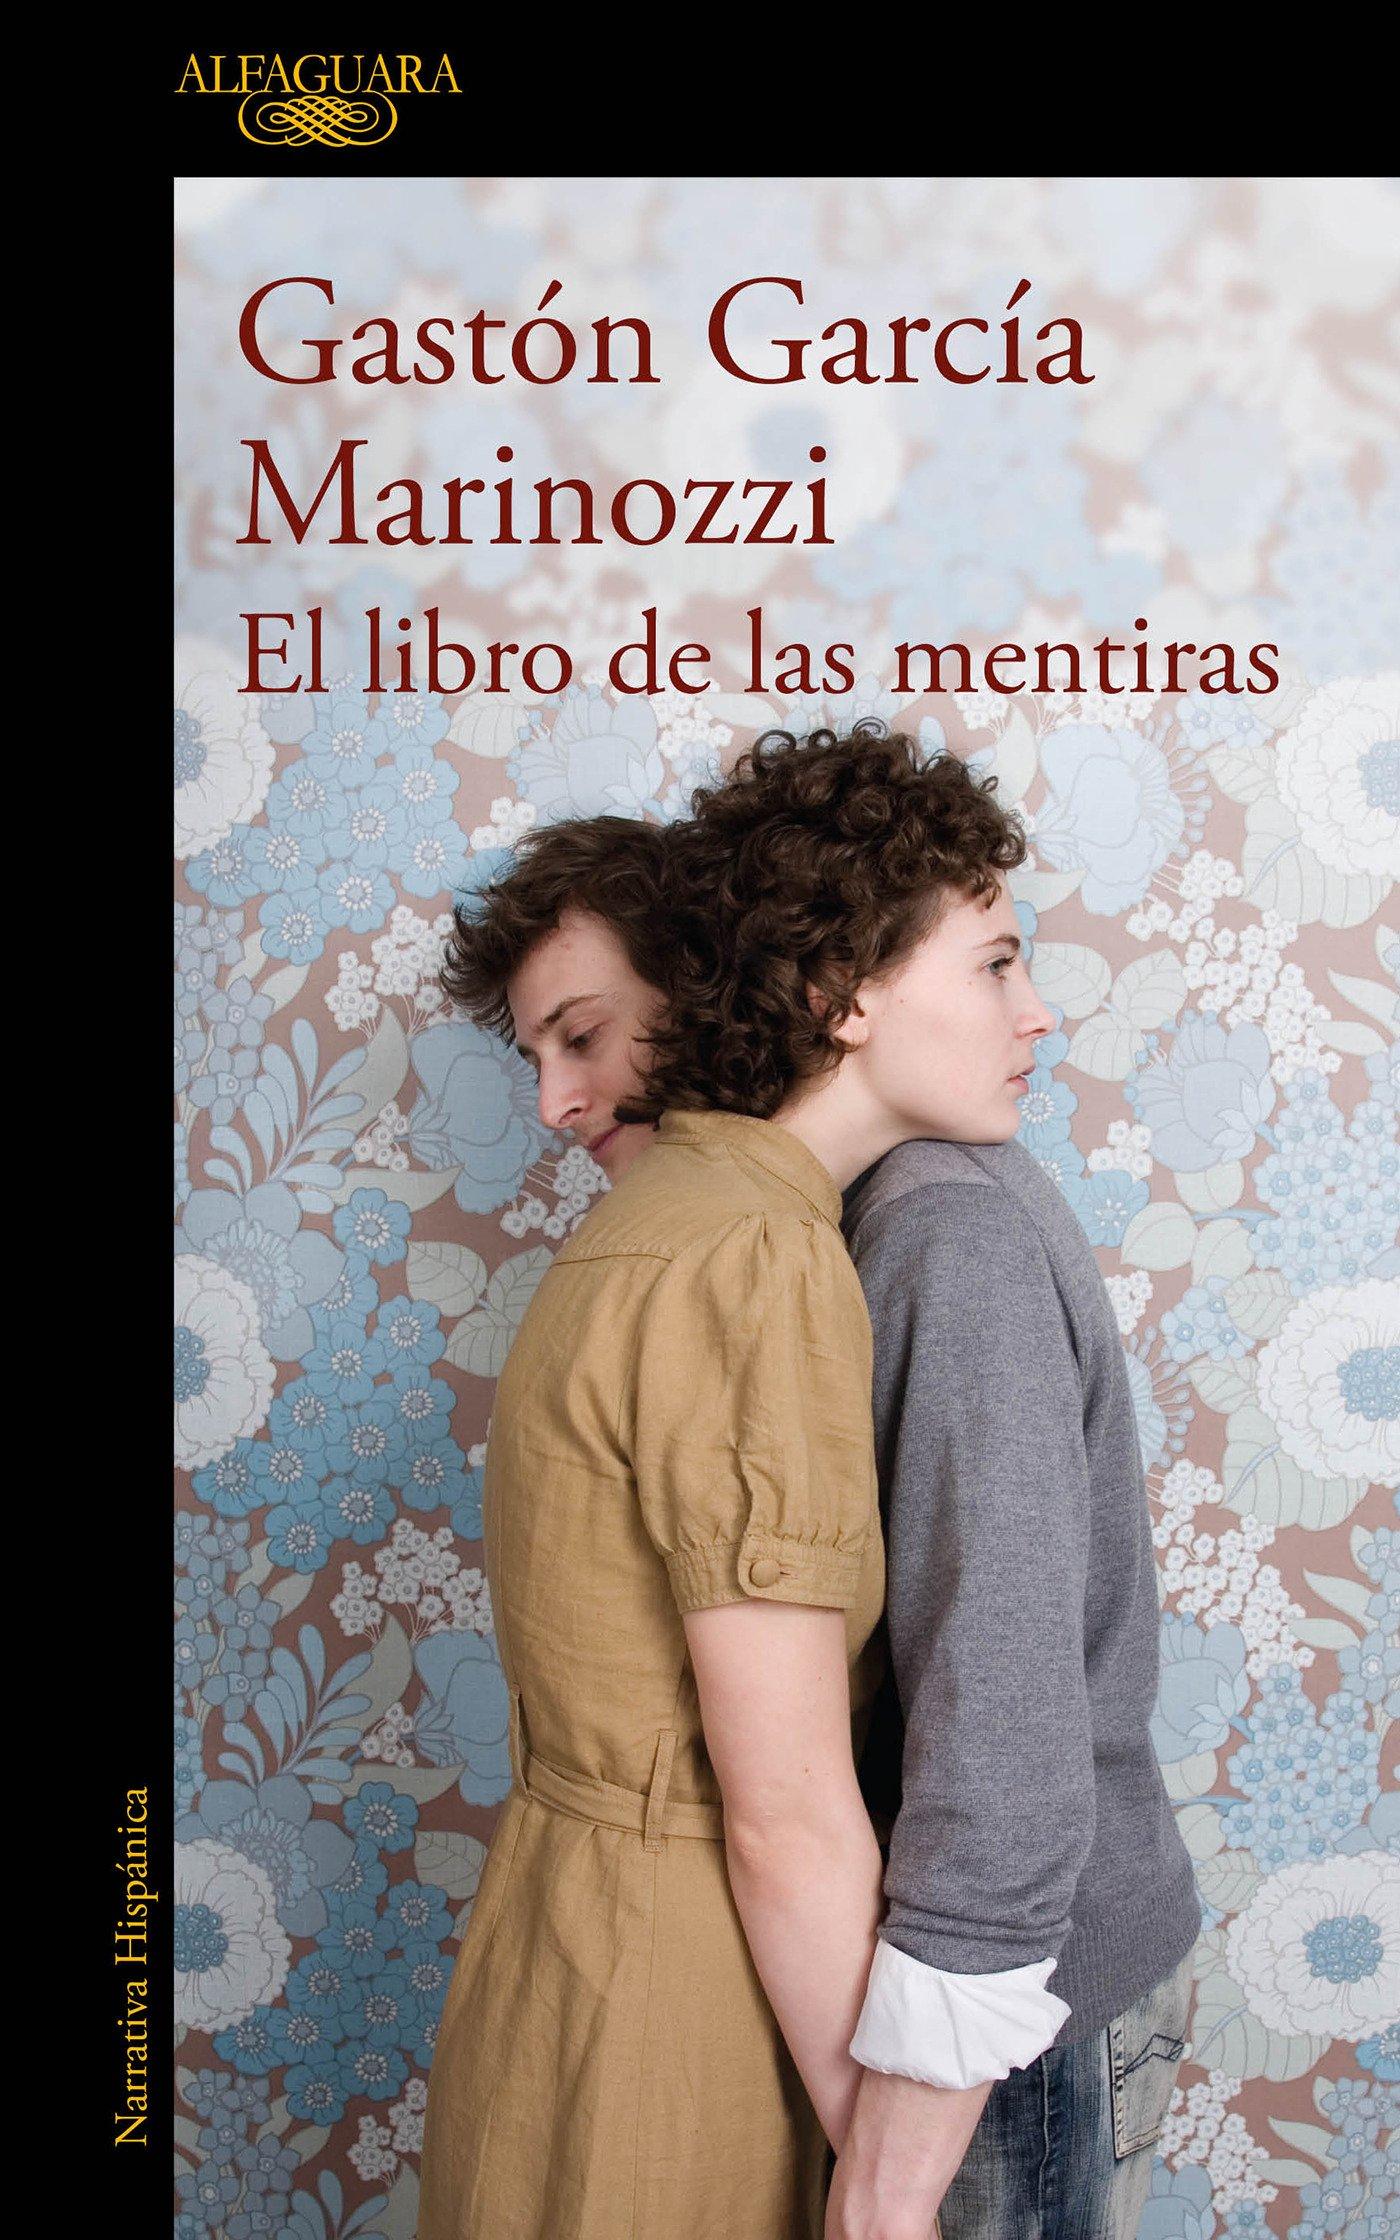 El libro de las mentiras / The Book of Lies (Spanish Edition): Gaston Garcia Marinozzi: 9786073168694: Amazon.com: Books